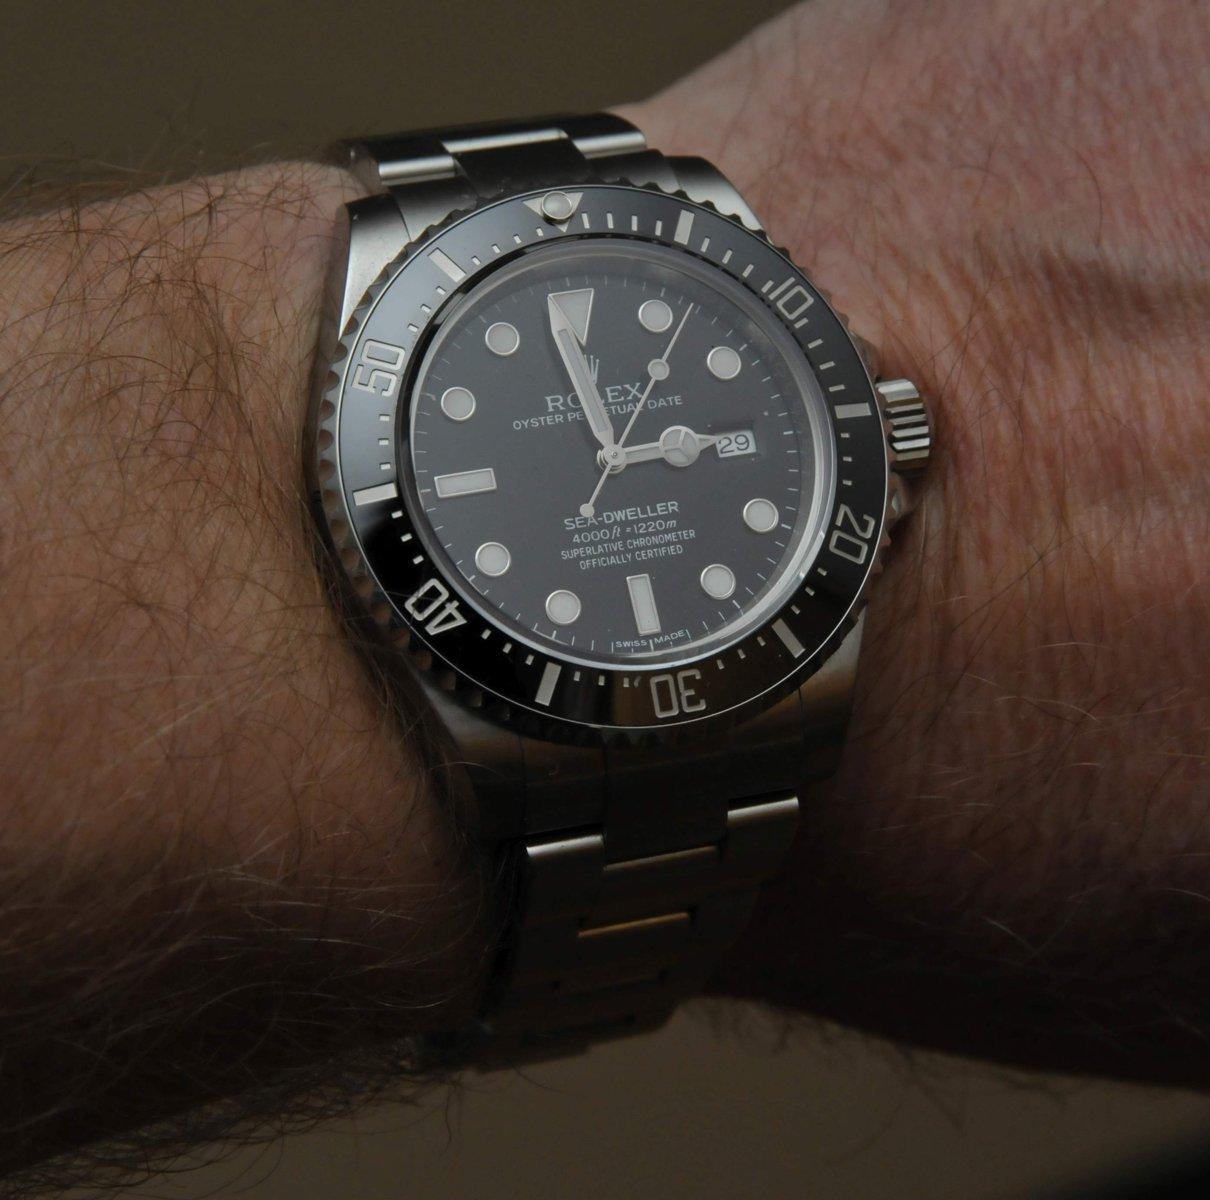 Rolex - hel.jpg